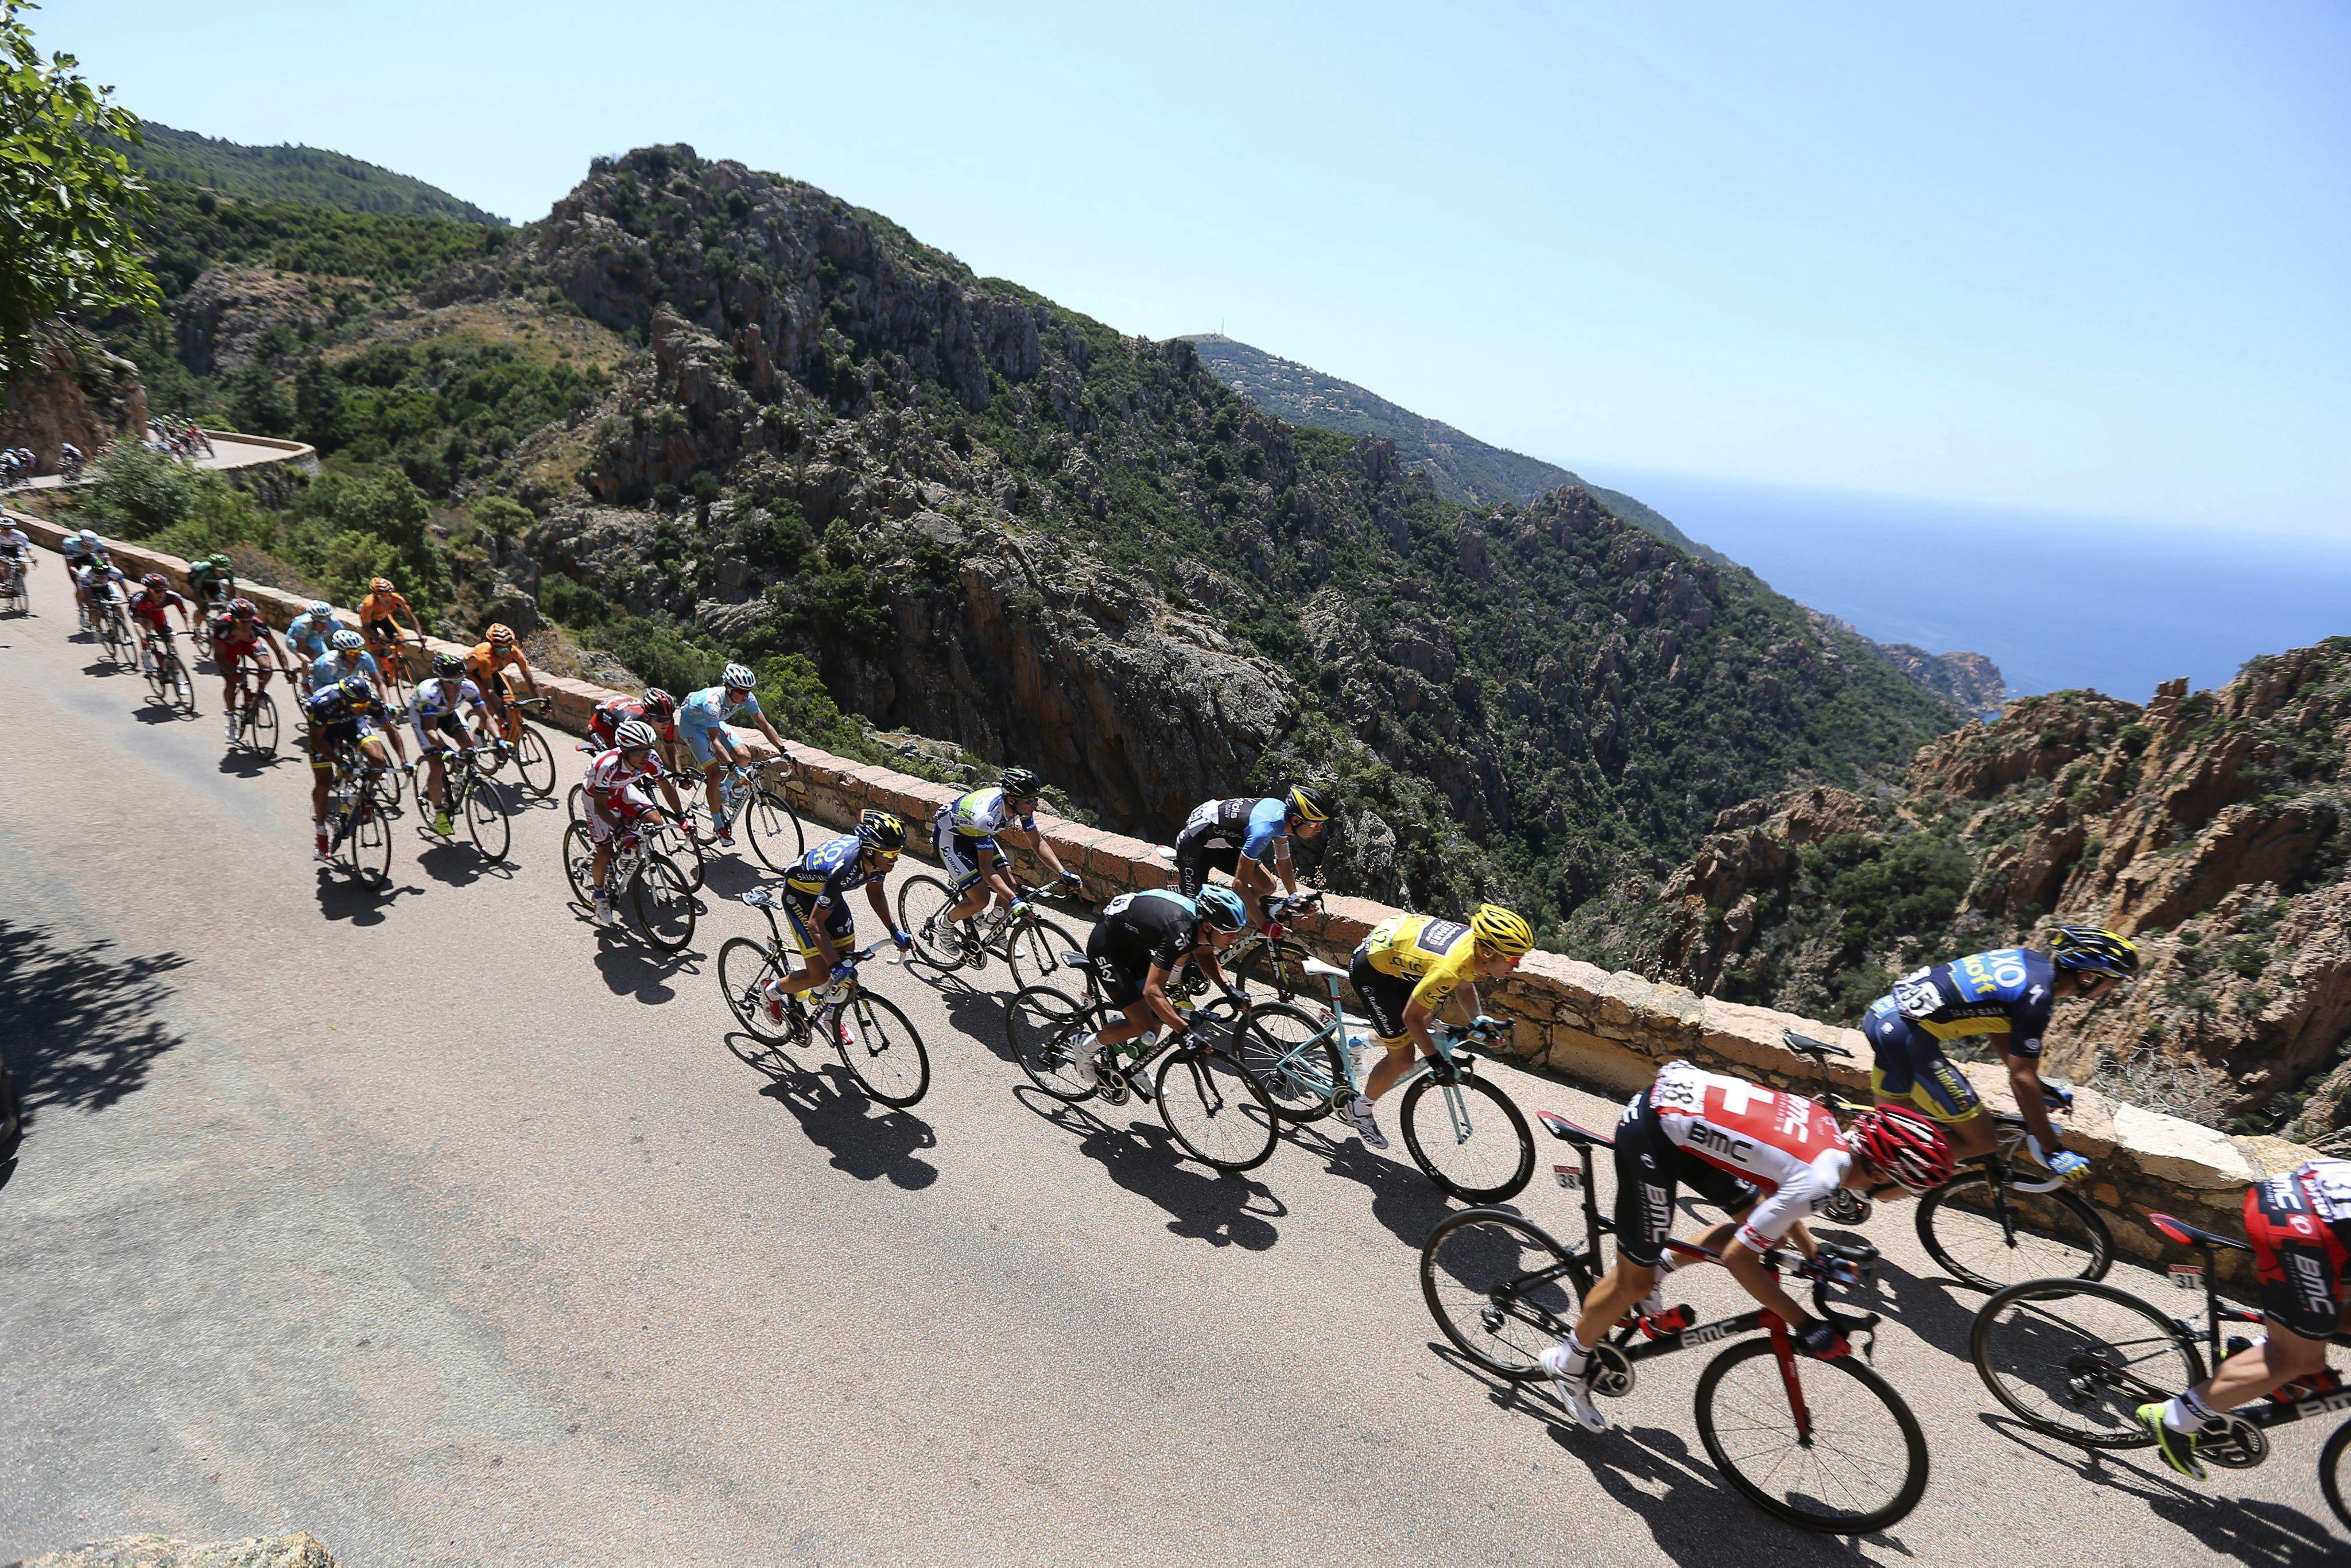 Gerrans vence al esprín en la tercera etapa del Tour y Bakelants sigue líder